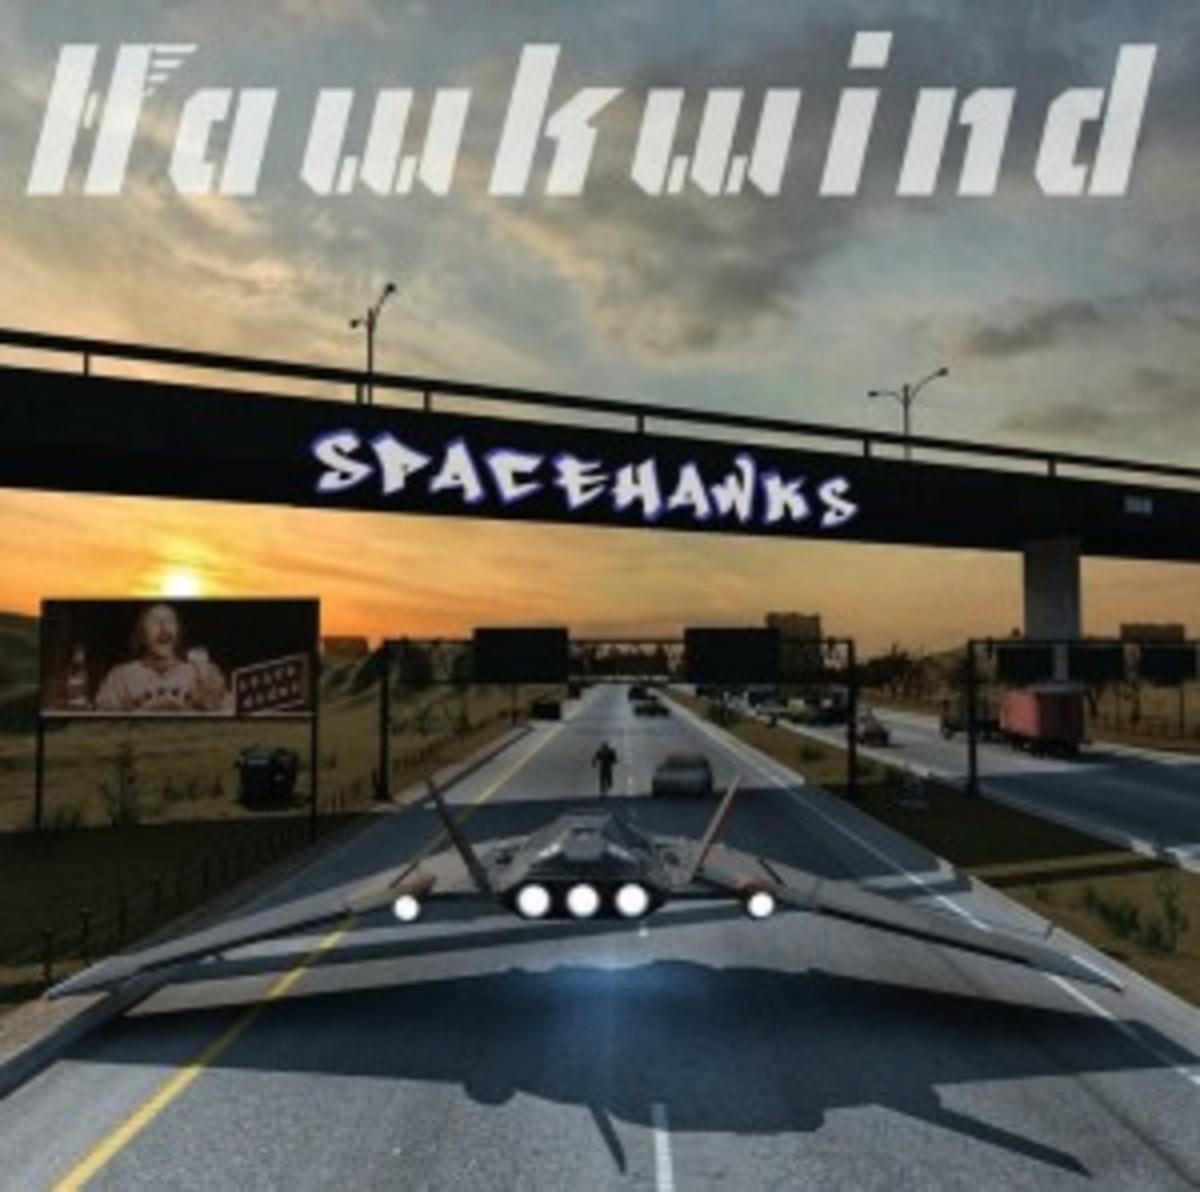 hawkwind_spacehawks_cover 72dpi